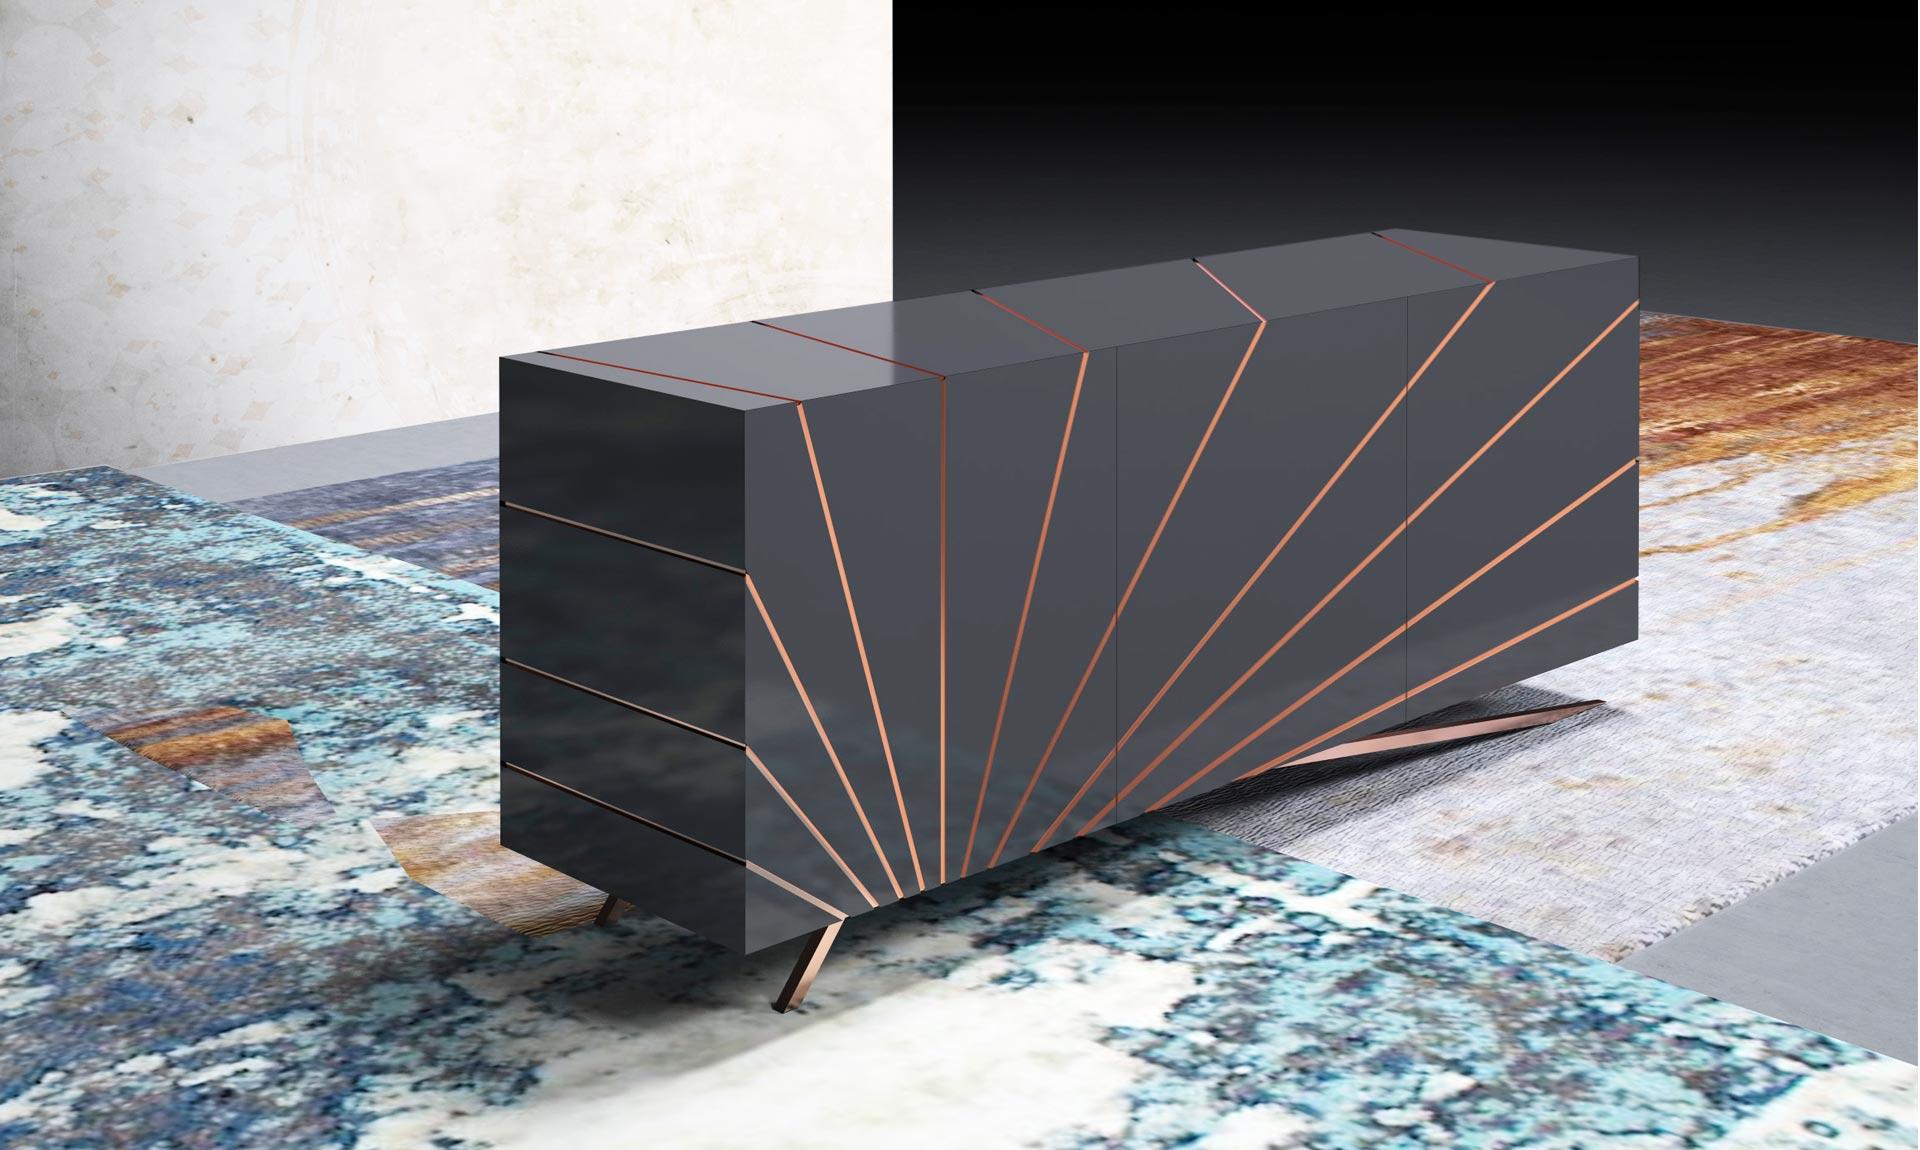 madia modello Solaris by Riflessi